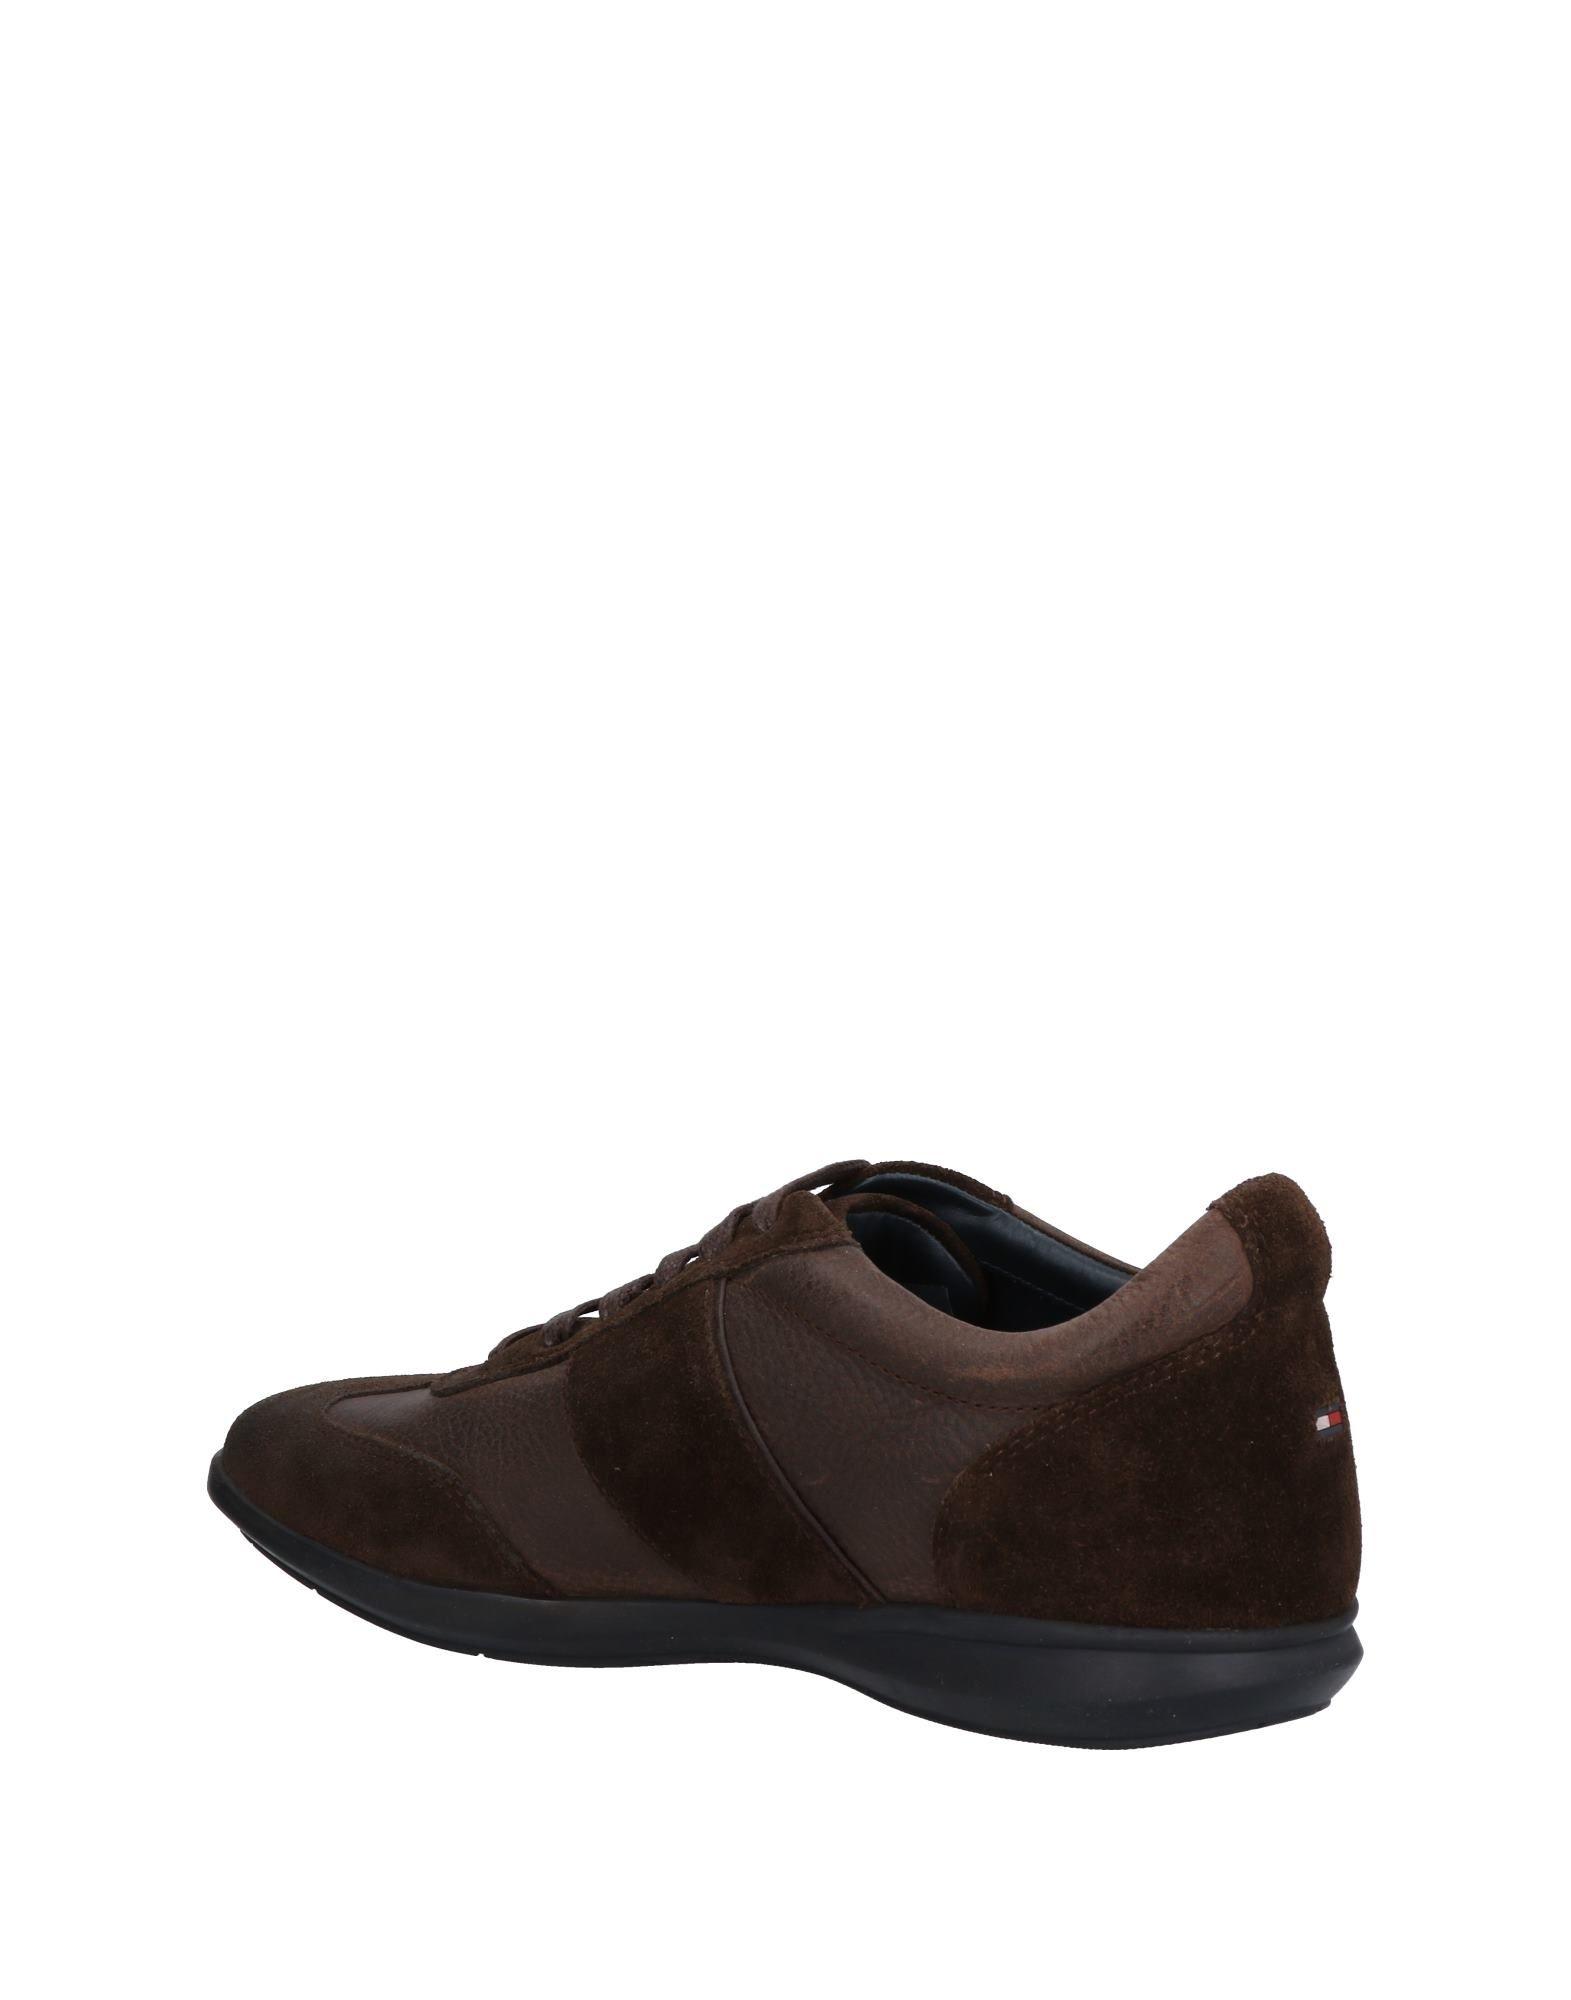 Rabatt echte Schuhe  Tommy Hilfiger Sneakers Herren  Schuhe 11393548PG 2bb2d5